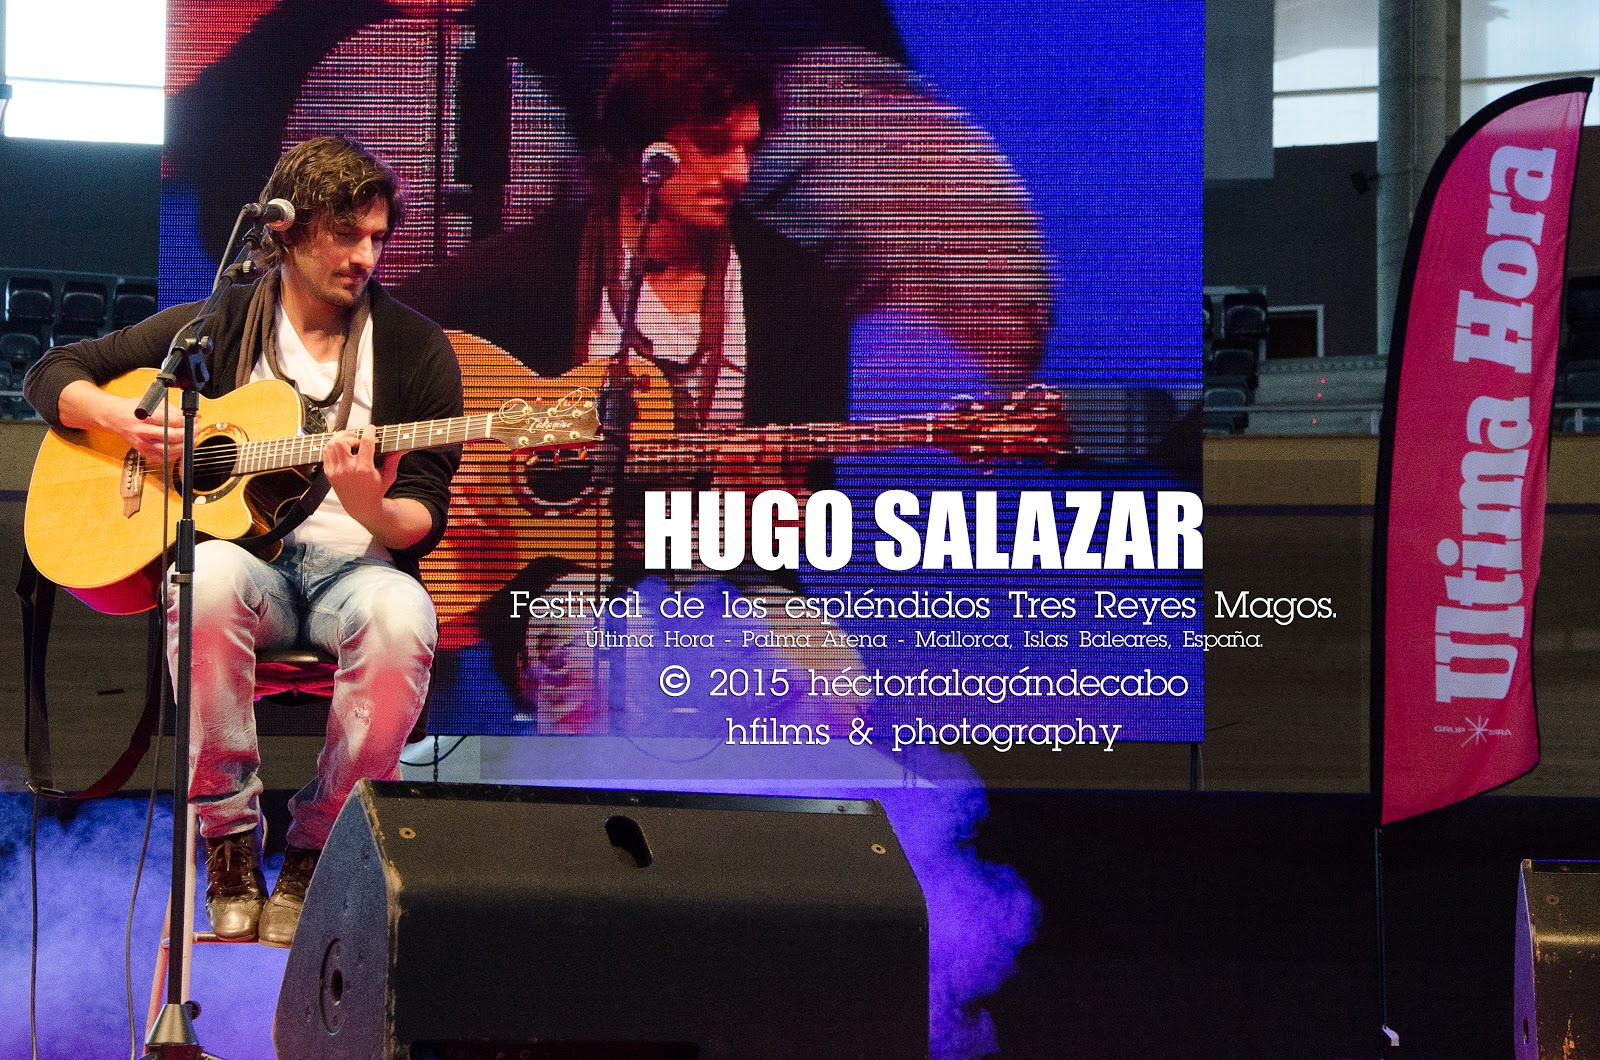 Hugo Salazar - Festival de los espléndidos Tres Reyes Magos. Fotografías por: Héctor Falagán De Cabo / hfilms & photography.